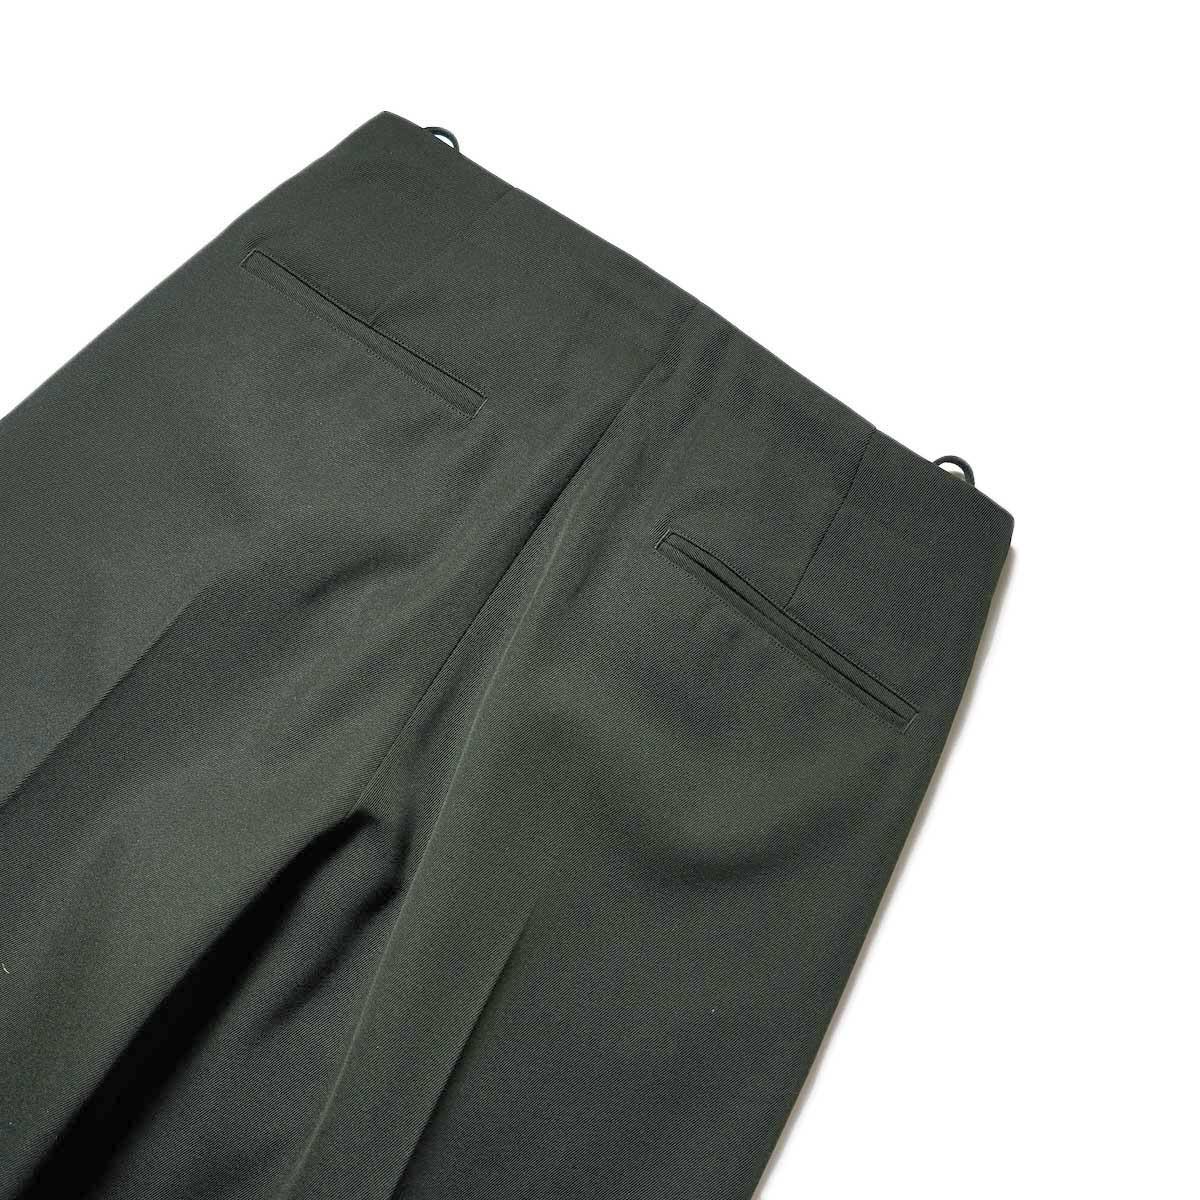 Blurhms / Wool Surge Super Wide Easy Slacks (Khaki Grey)ヒップポケット